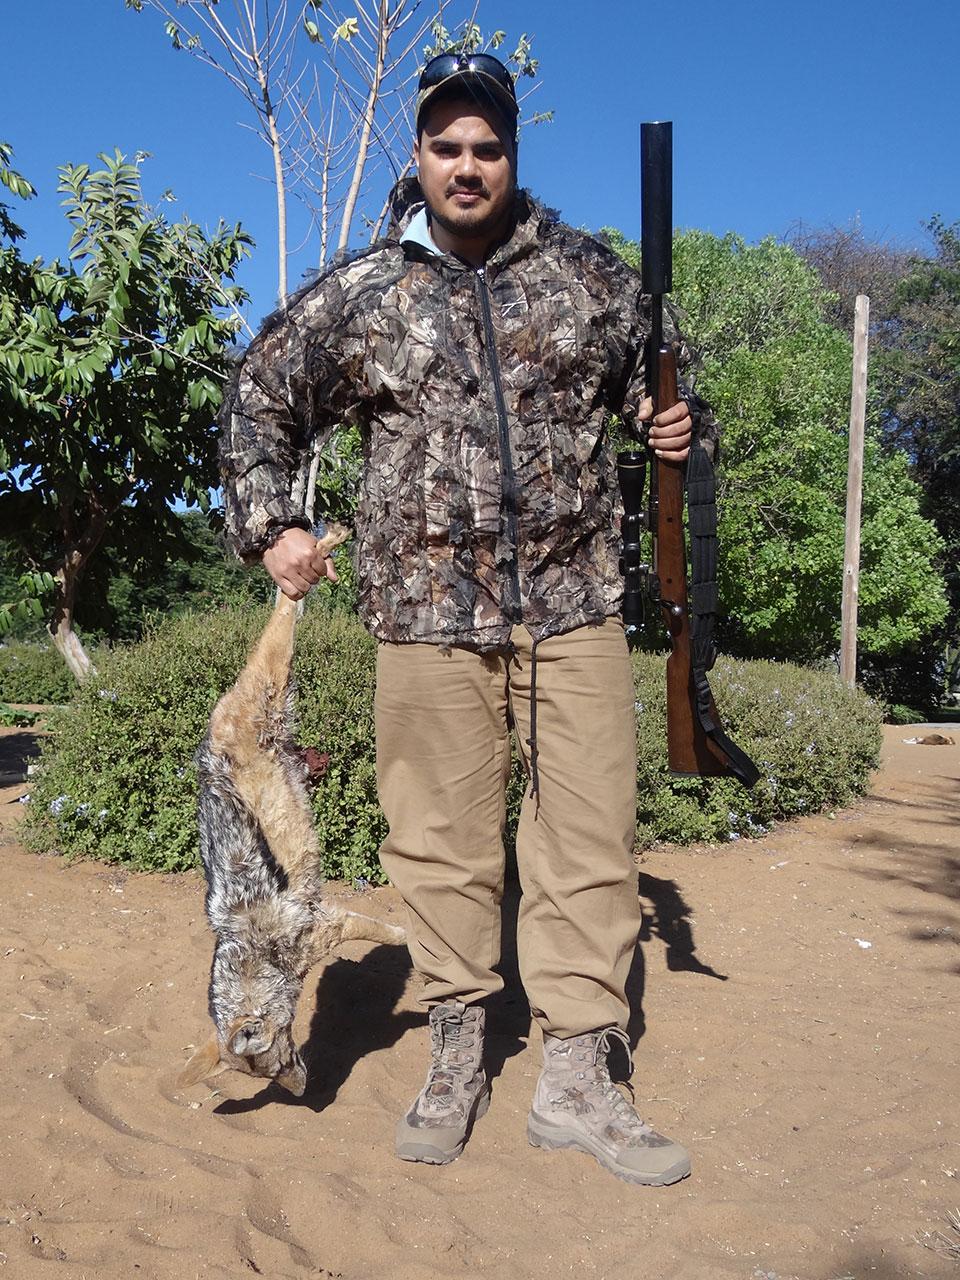 Jackal-Hunting-Namibia-Africa.jpg